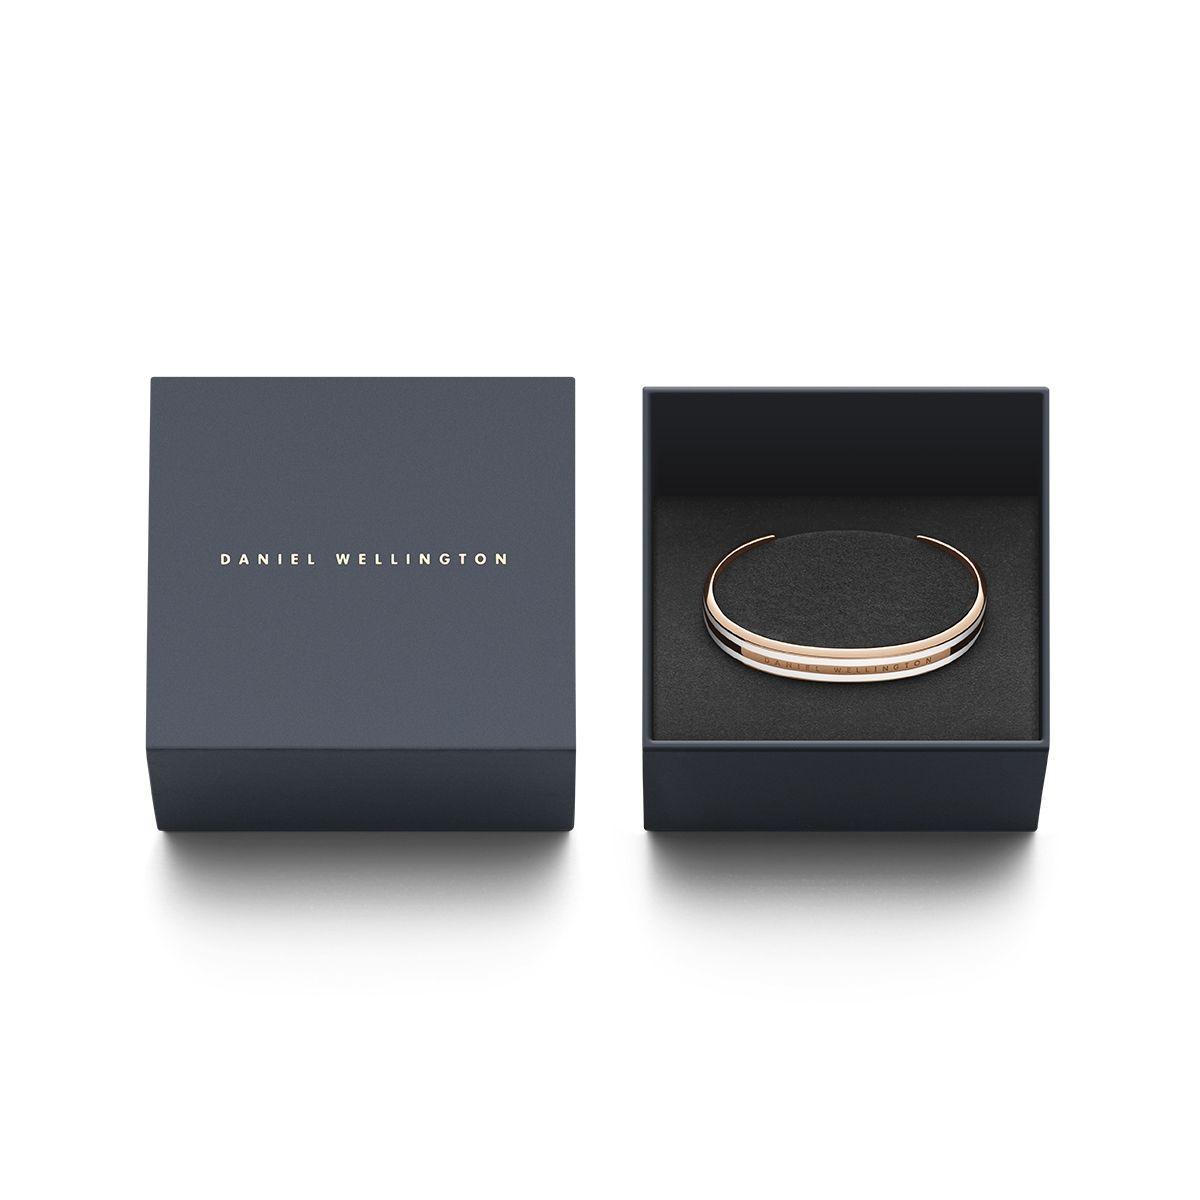 dw官网 dw手表官网 dw中国官网 dw官方旗舰店 DW DW官网  Classic Slim Bracelet Satin White RG M